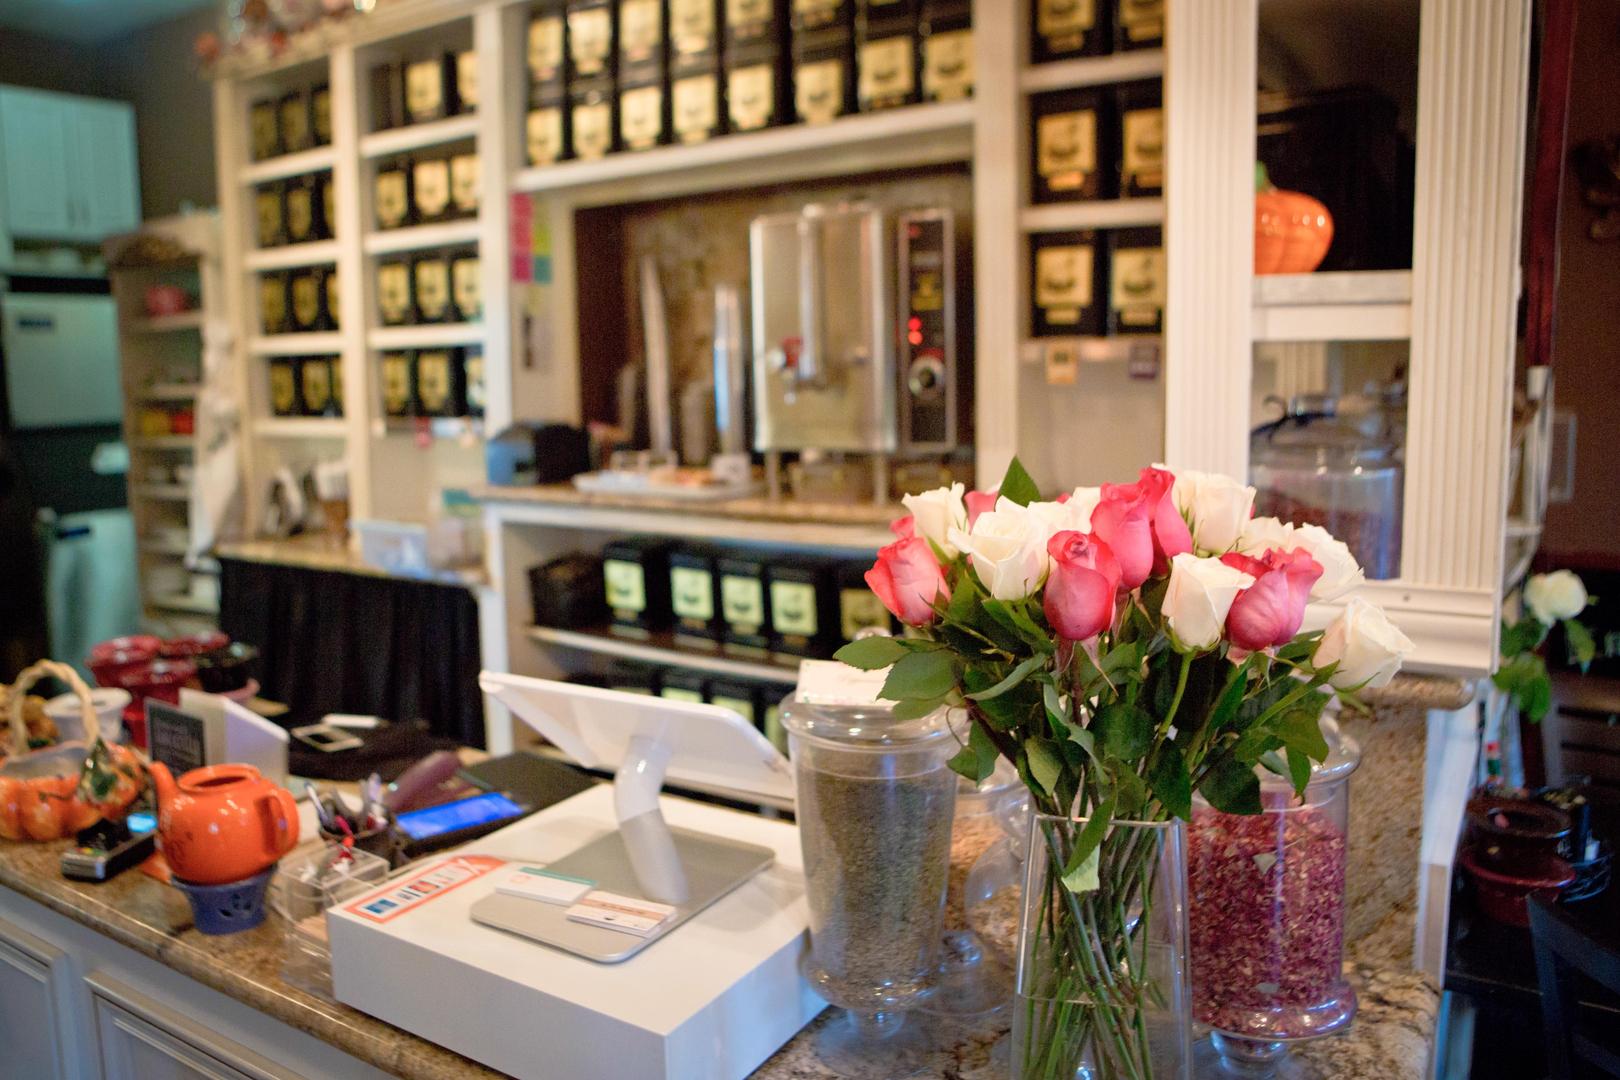 Tea Elle C Garden Cafe\' in Santa Clarita, Ca